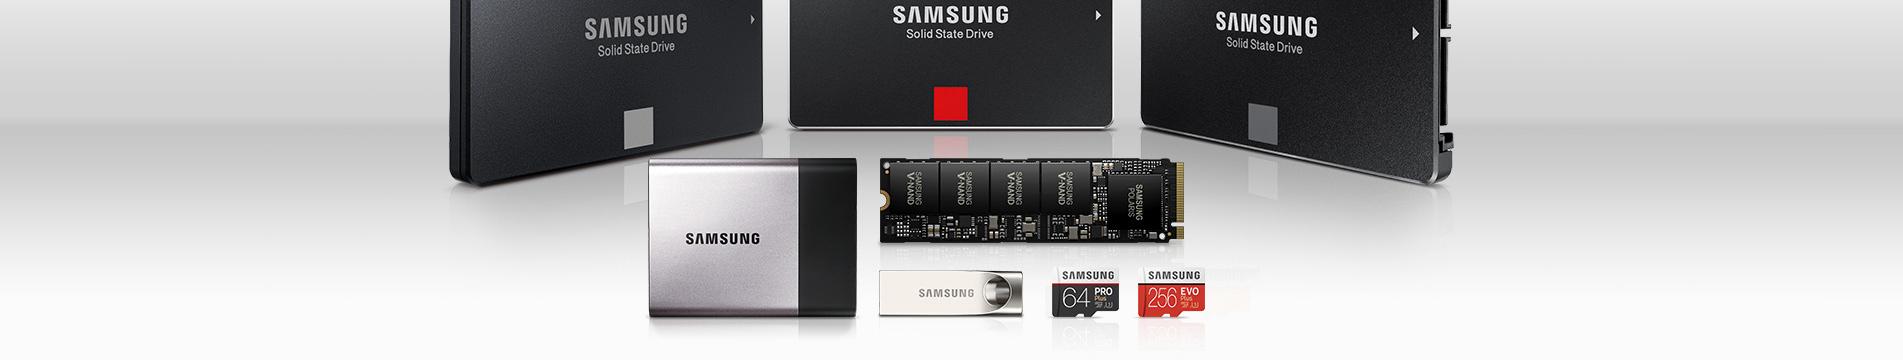 Samsung Memory Product Claim